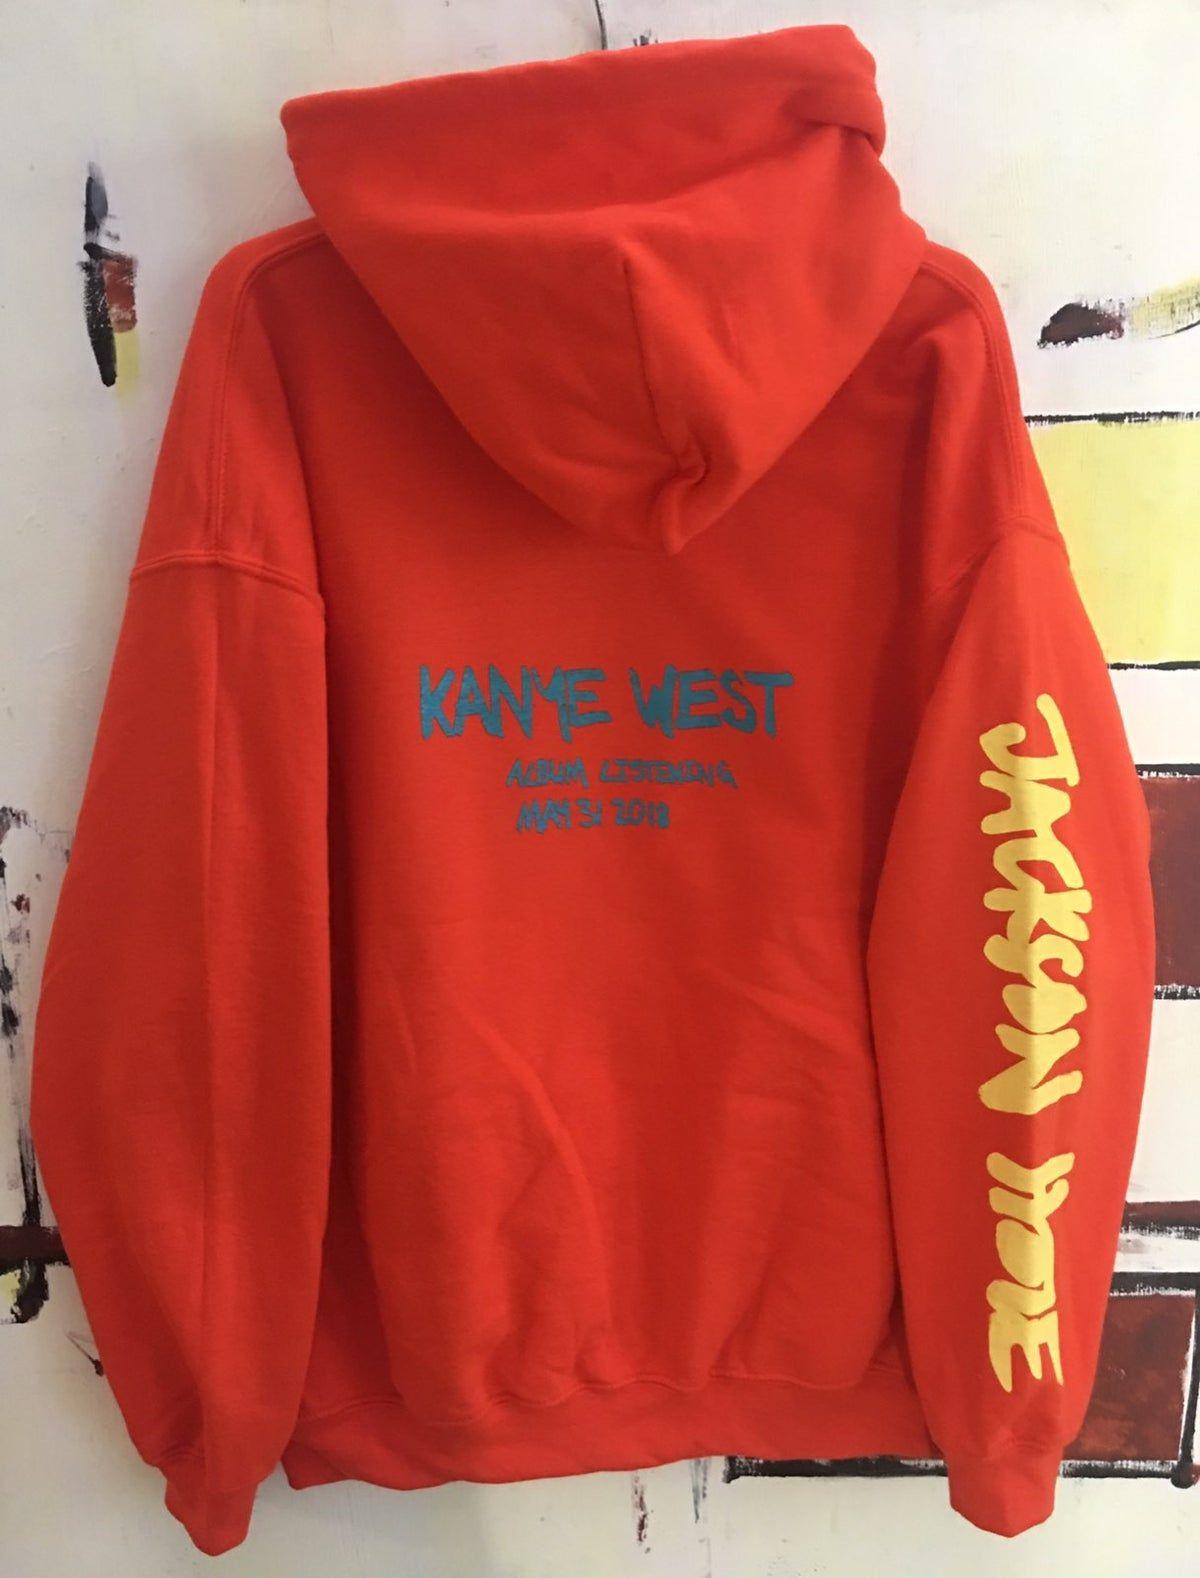 Kanye West Wyoming Hoodie In 2020 Kanye West Outfits Kanye West Kanye